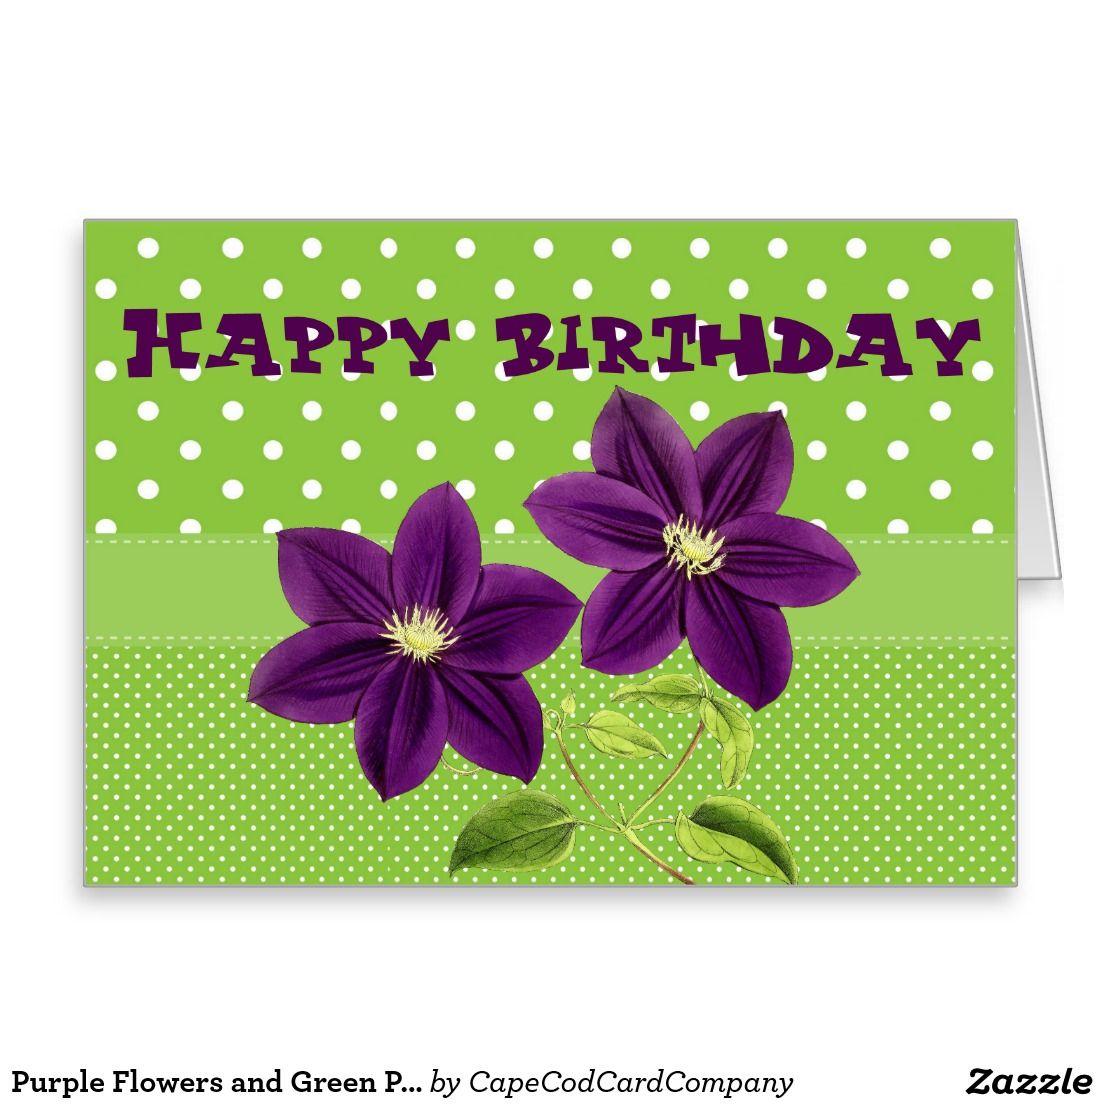 Purple flowers and green polka dot birthday card floral birthday purple flowers and green polka dot birthday card izmirmasajfo